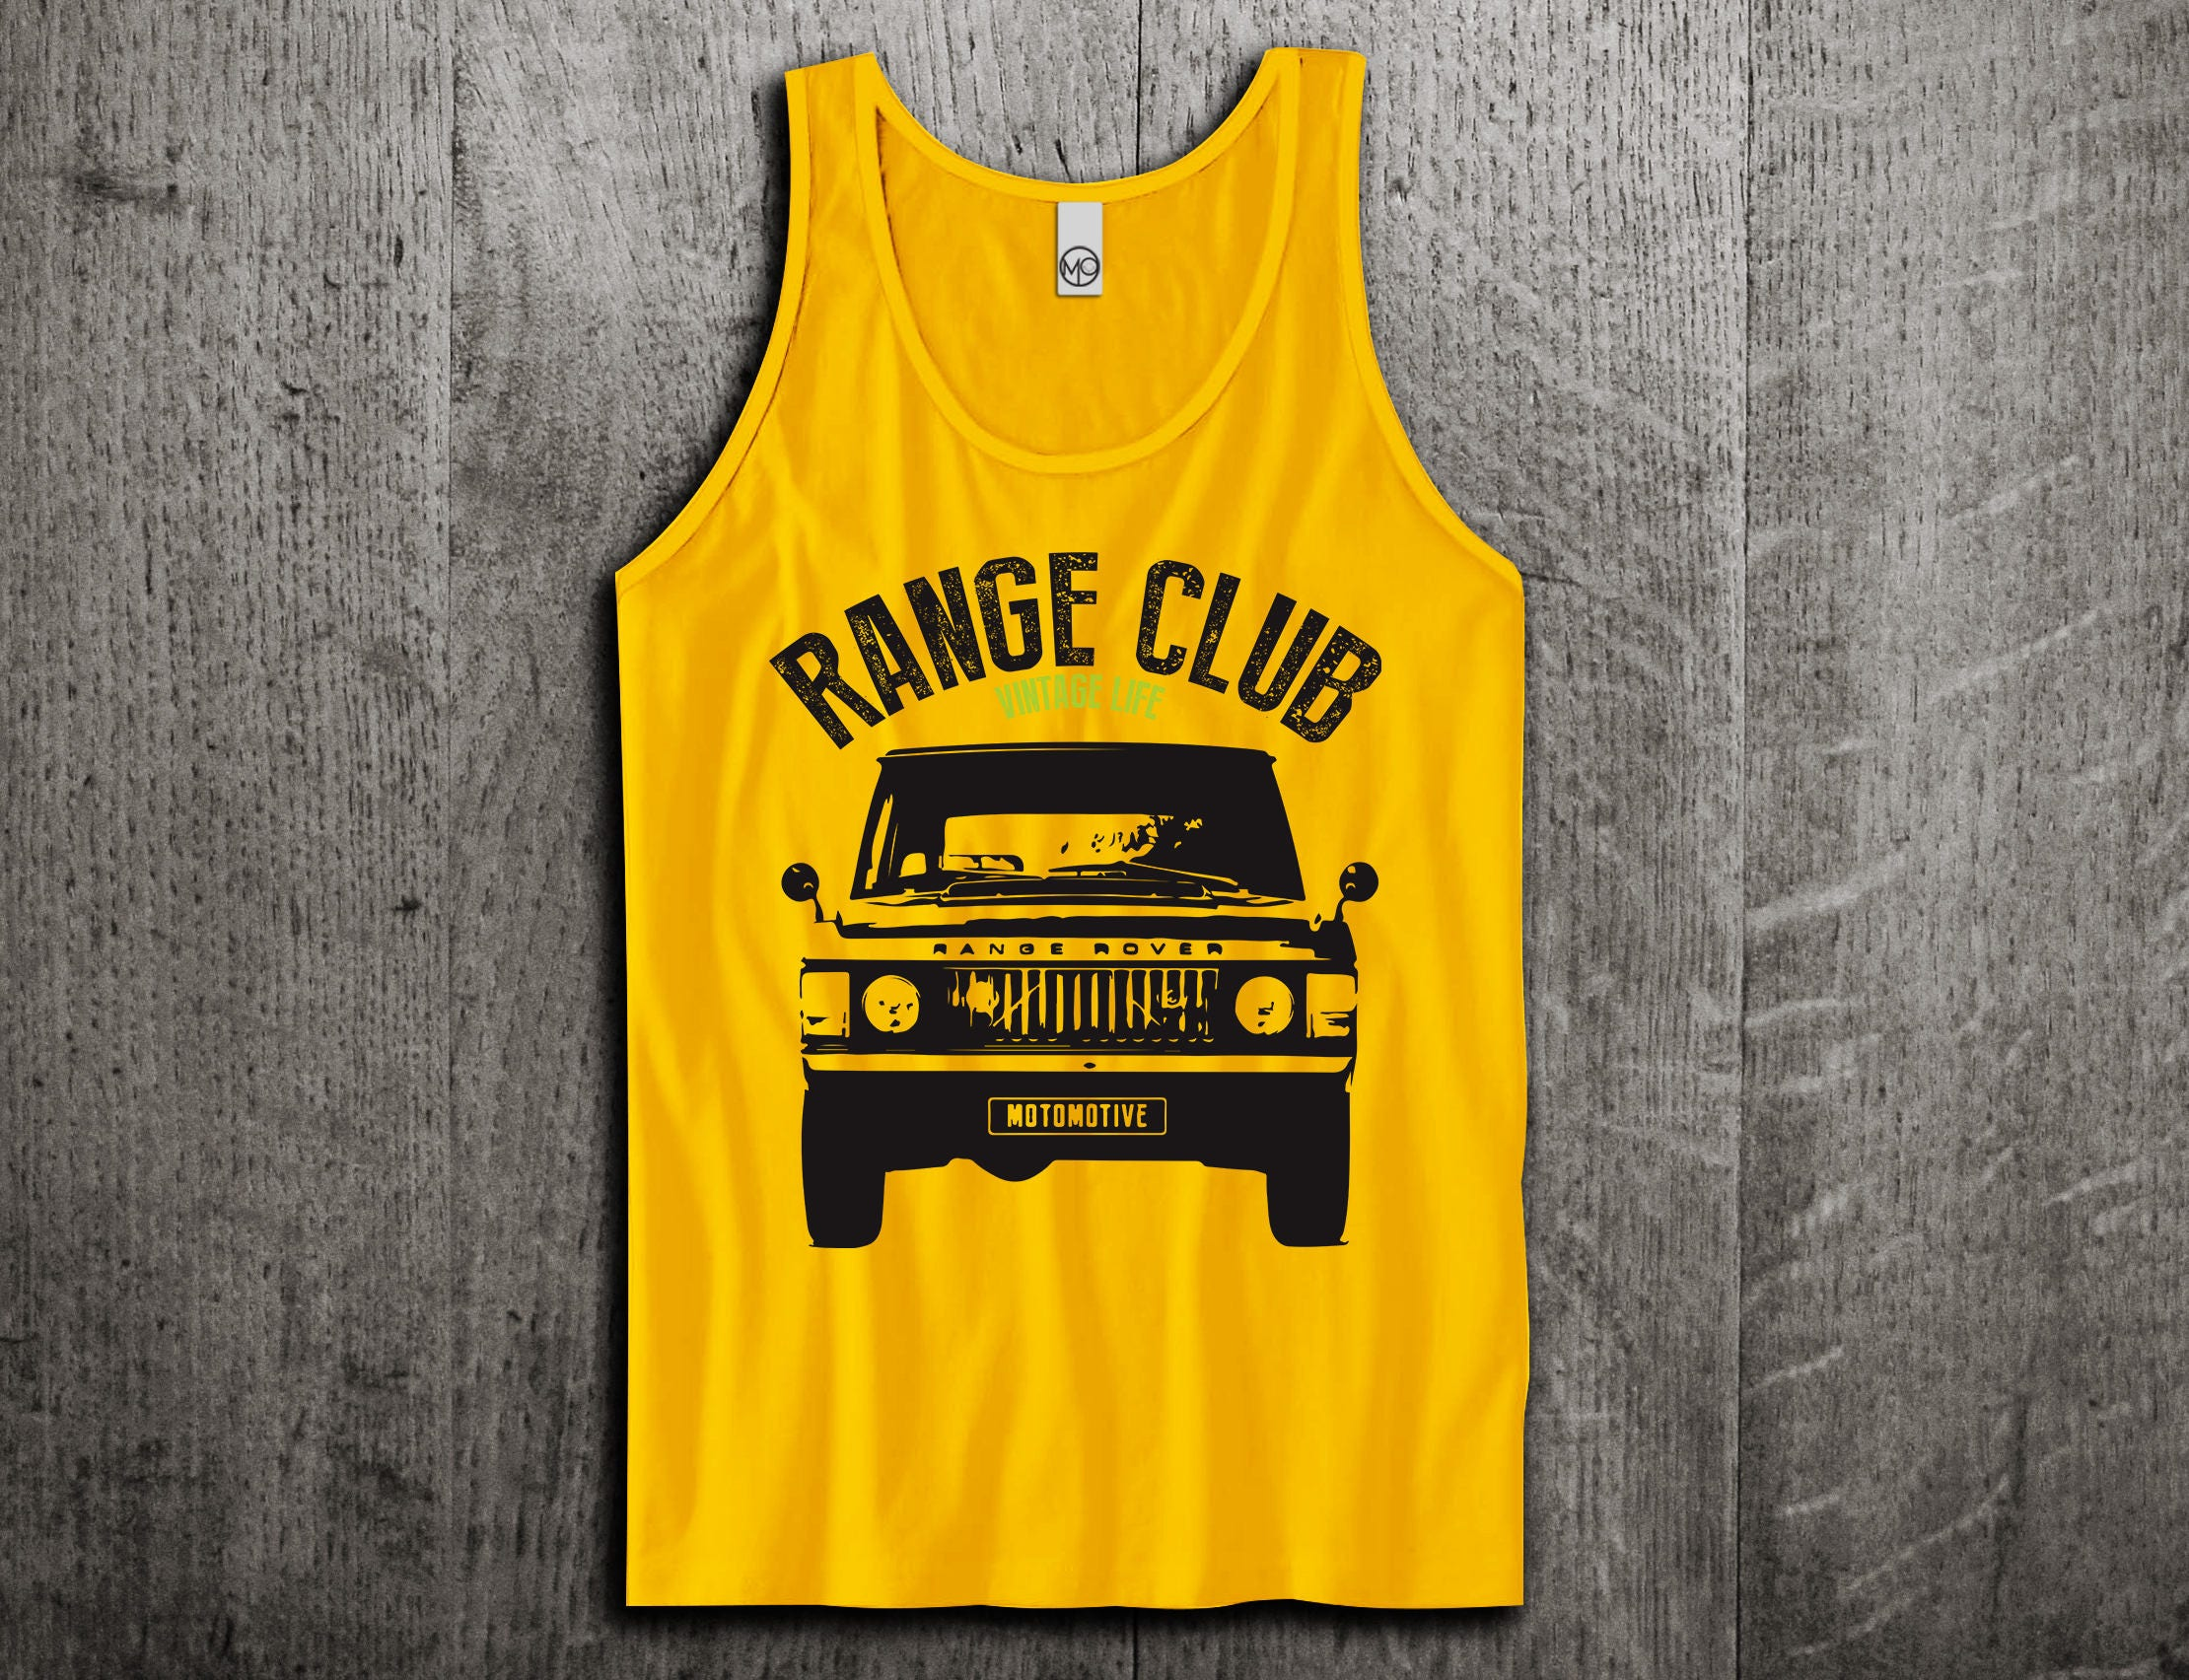 land warning tshirts about parts lro shirts gear shirt clothing may talking rovers t and rover landrover start